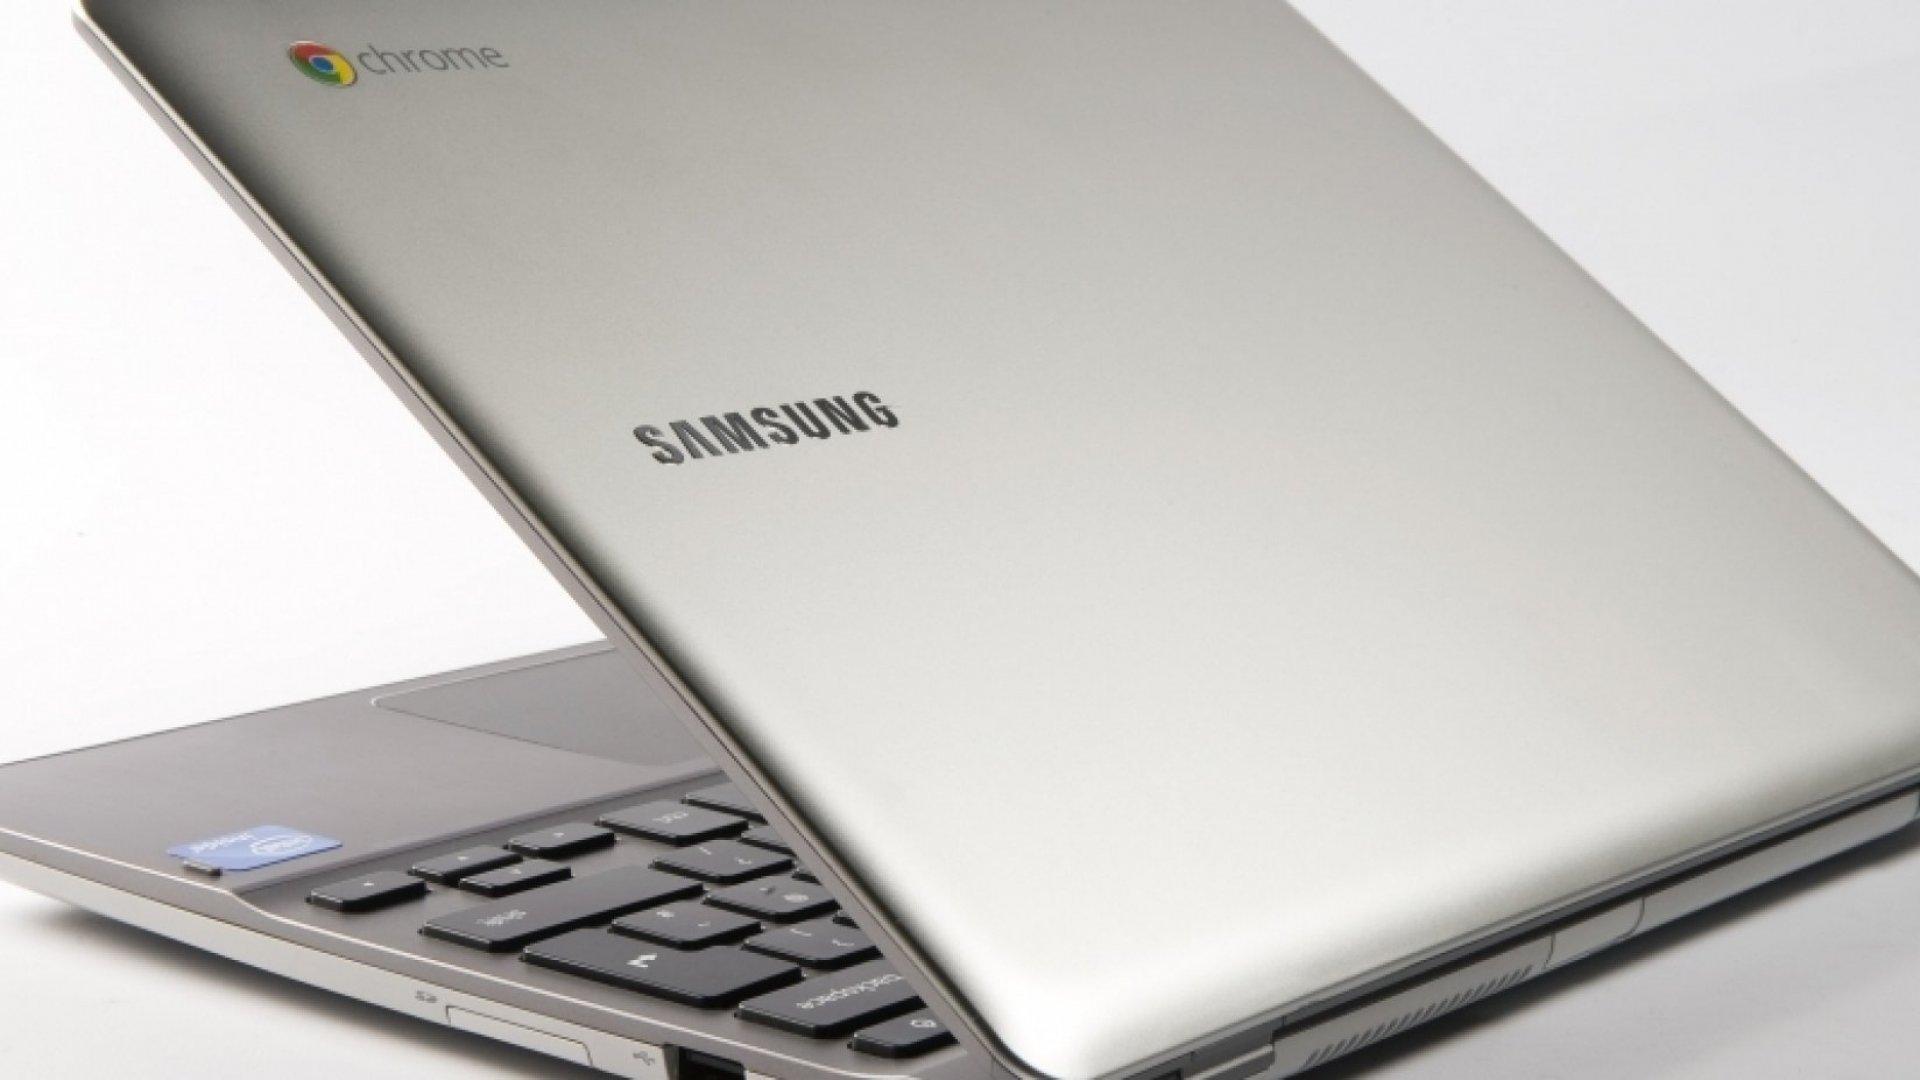 A Free Option Turns Old Windows XP Laptops into Chromebooks